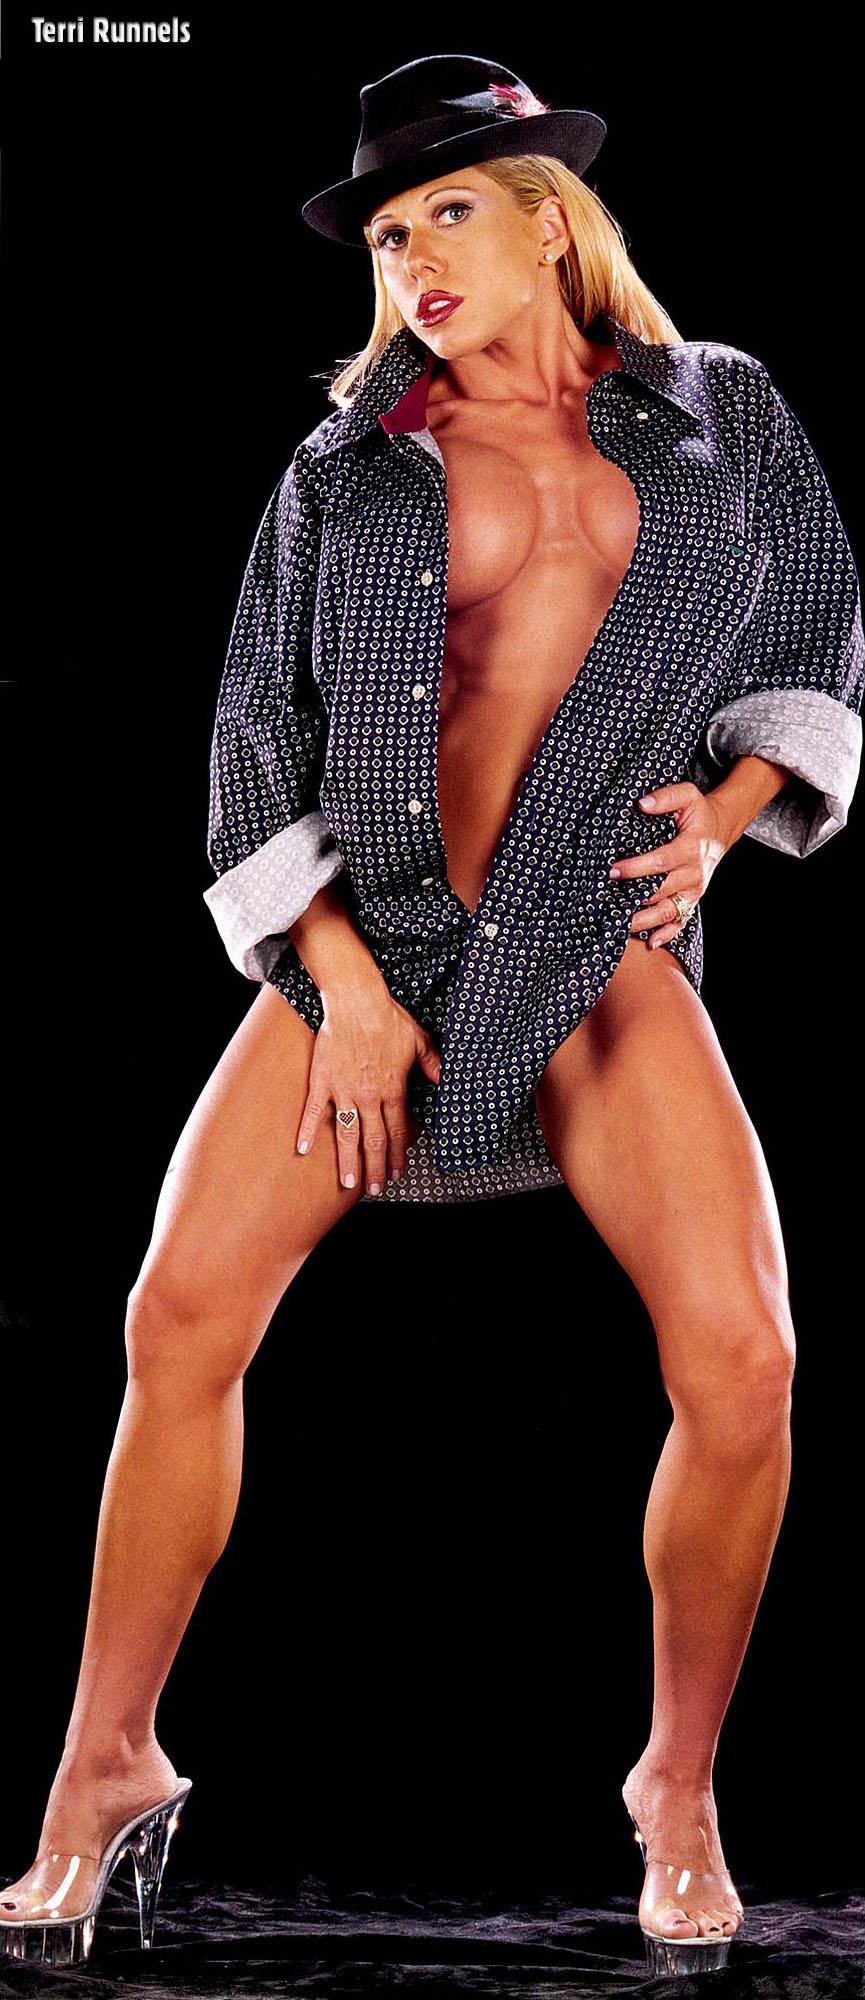 Terri runnels fake nude pics